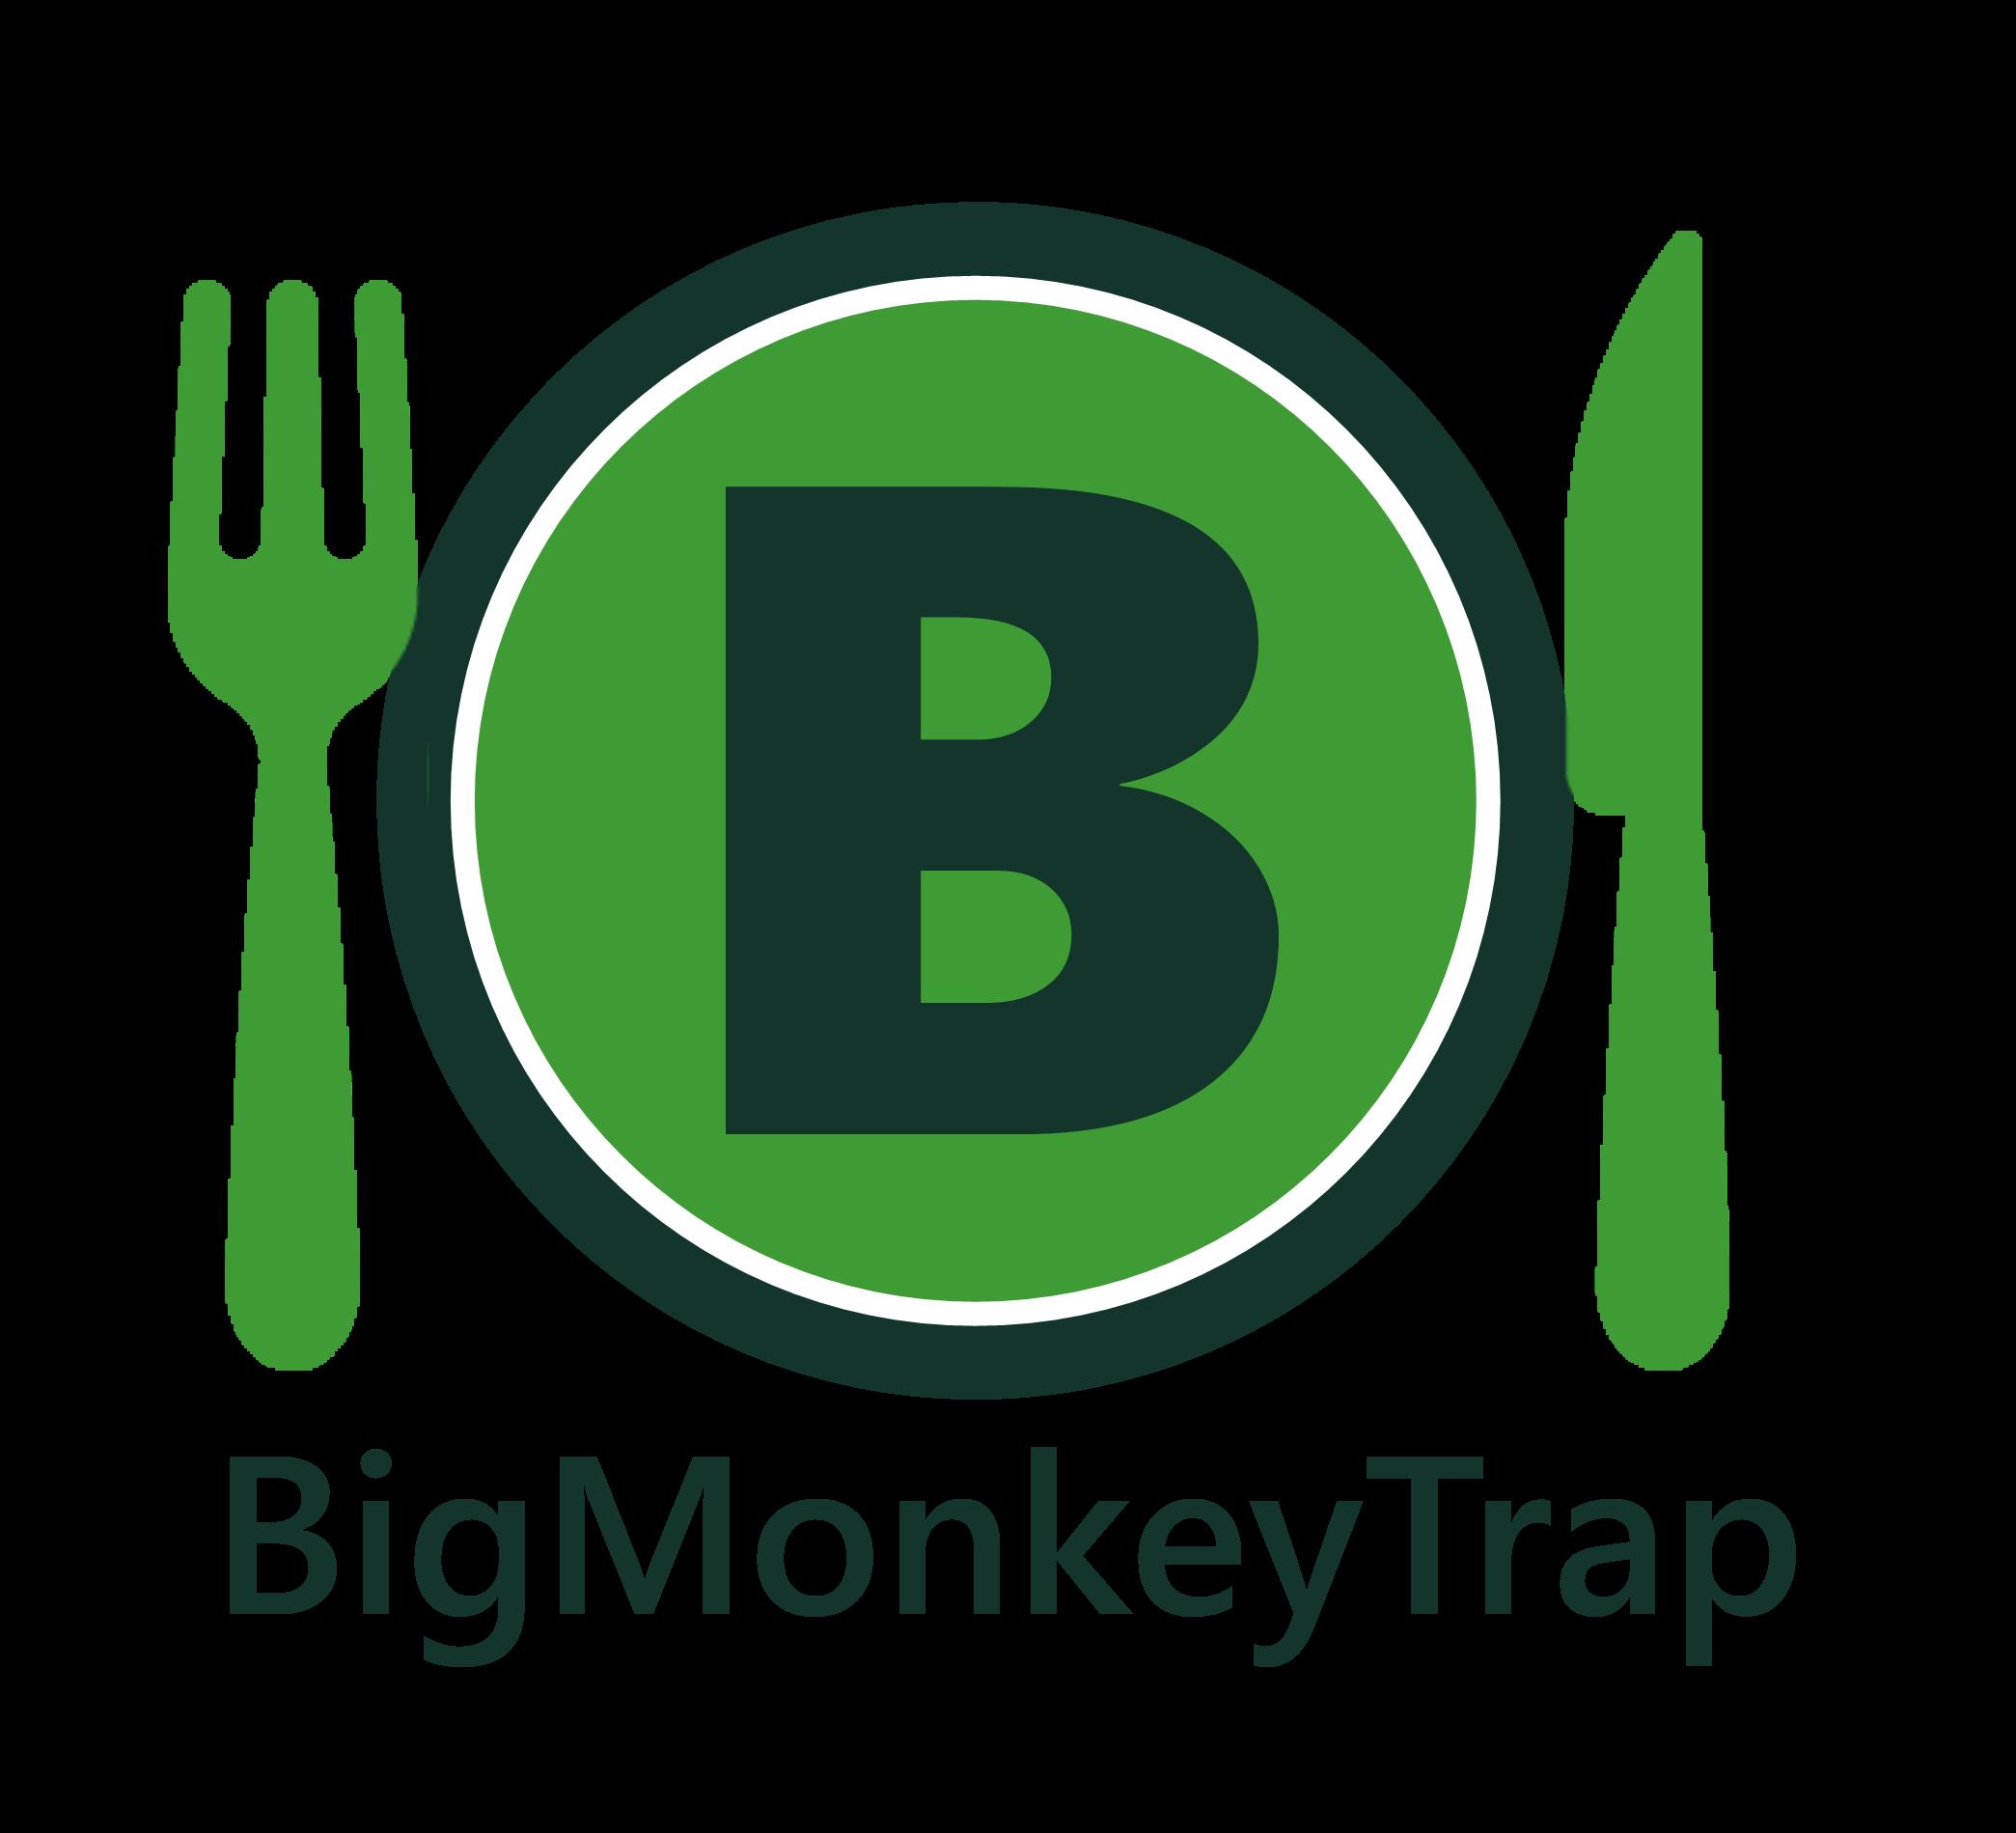 BigMonkeyTrap